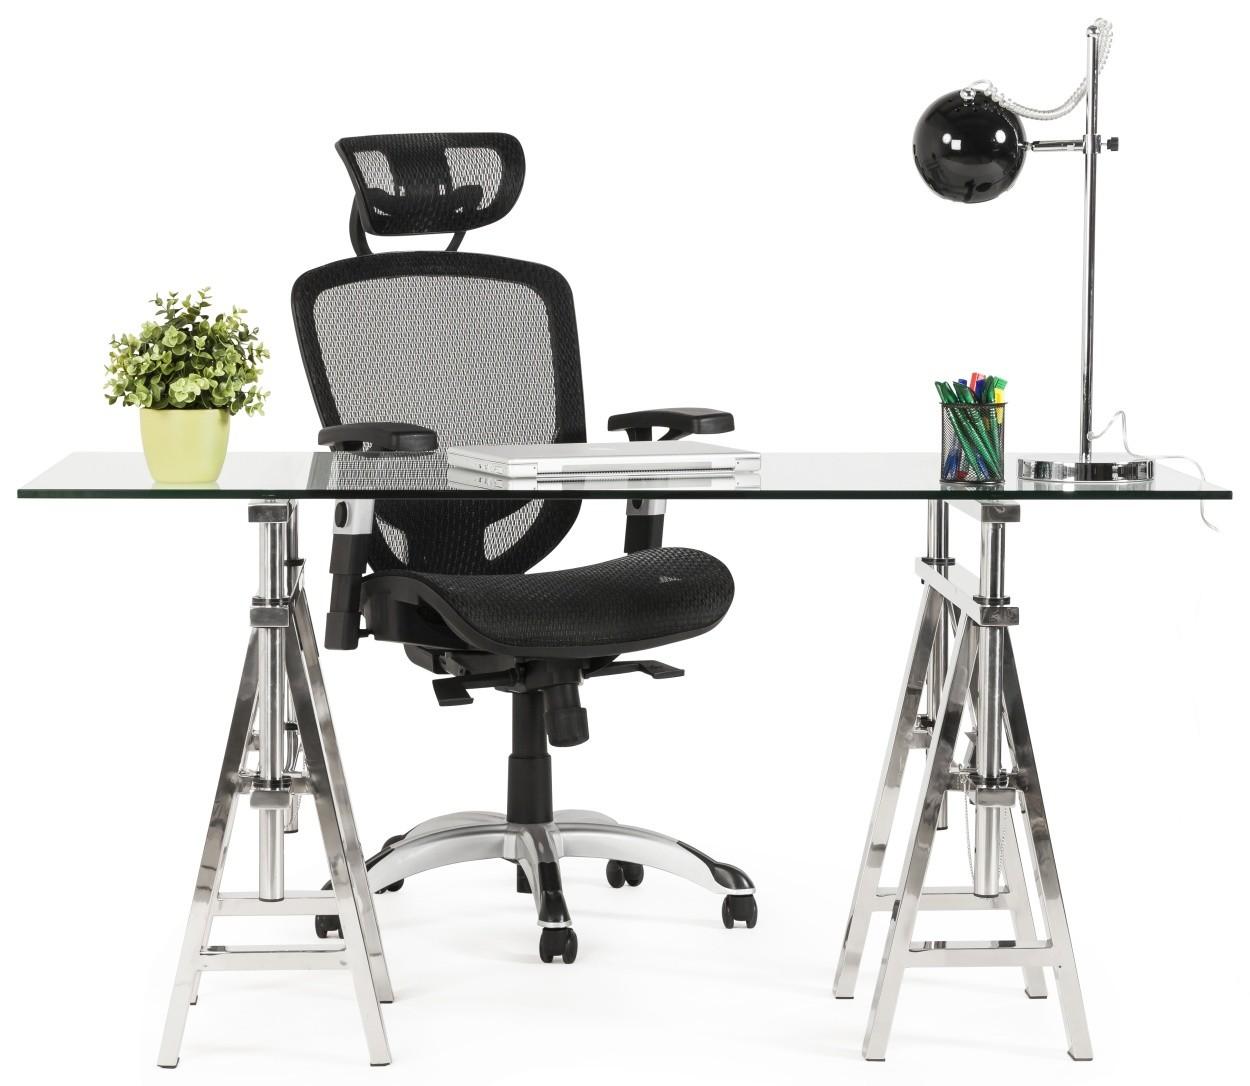 24Designs Bureaustoel Fondi - Hoofdsteun - Netwave Stof Zwart